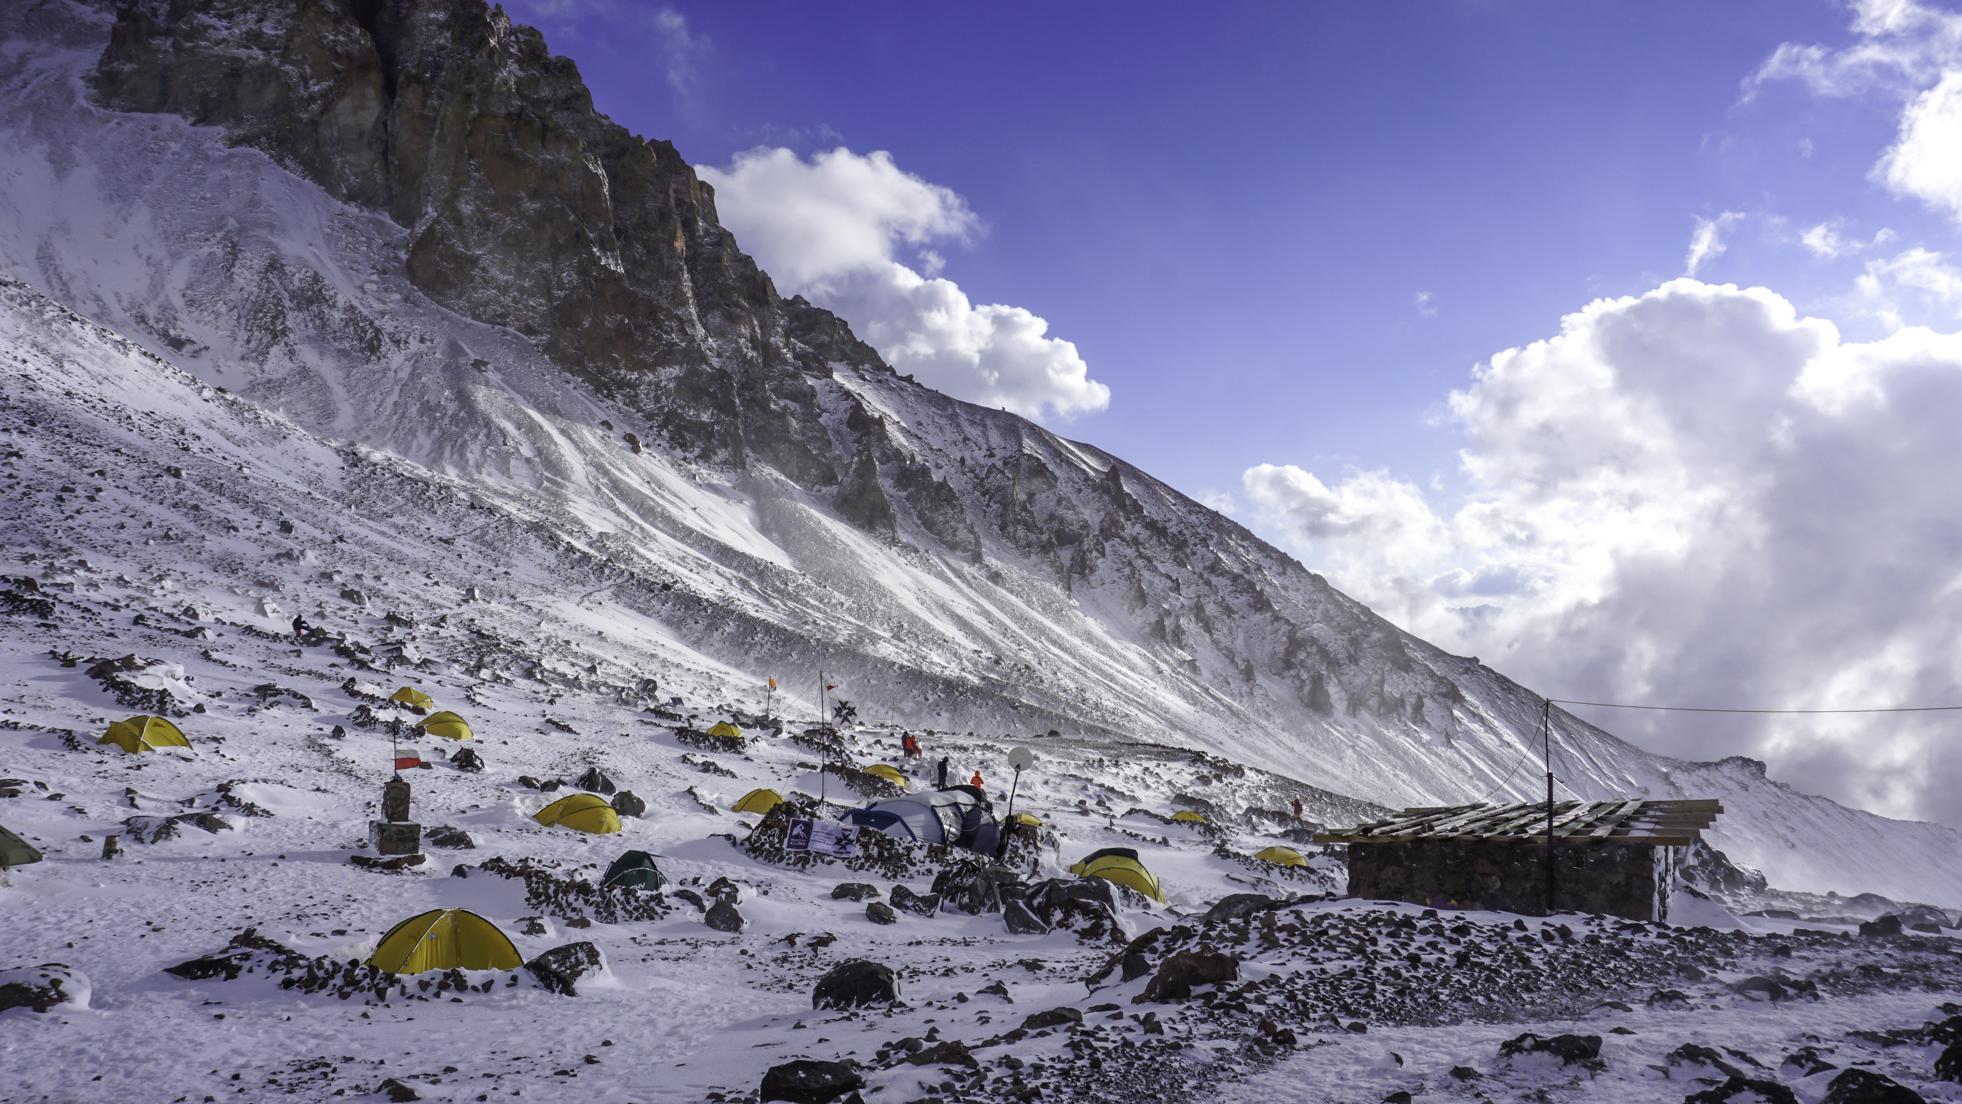 Kapryśny Kazbek – lekcja pokory wobec natury